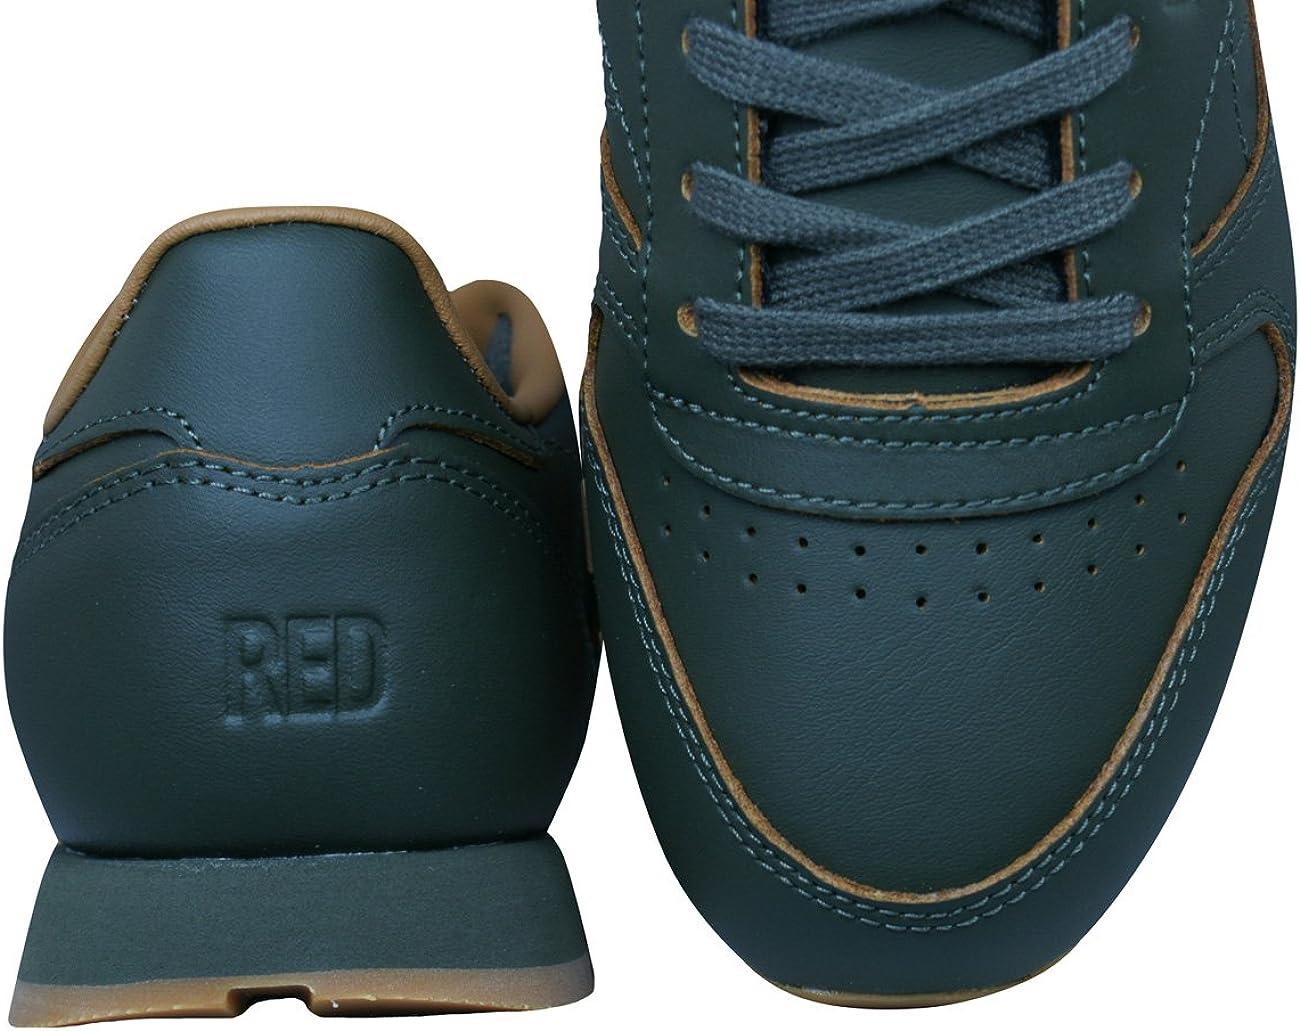 Reebok Classic Leather Kendrick Lamar BS7499, Basket: Amazon